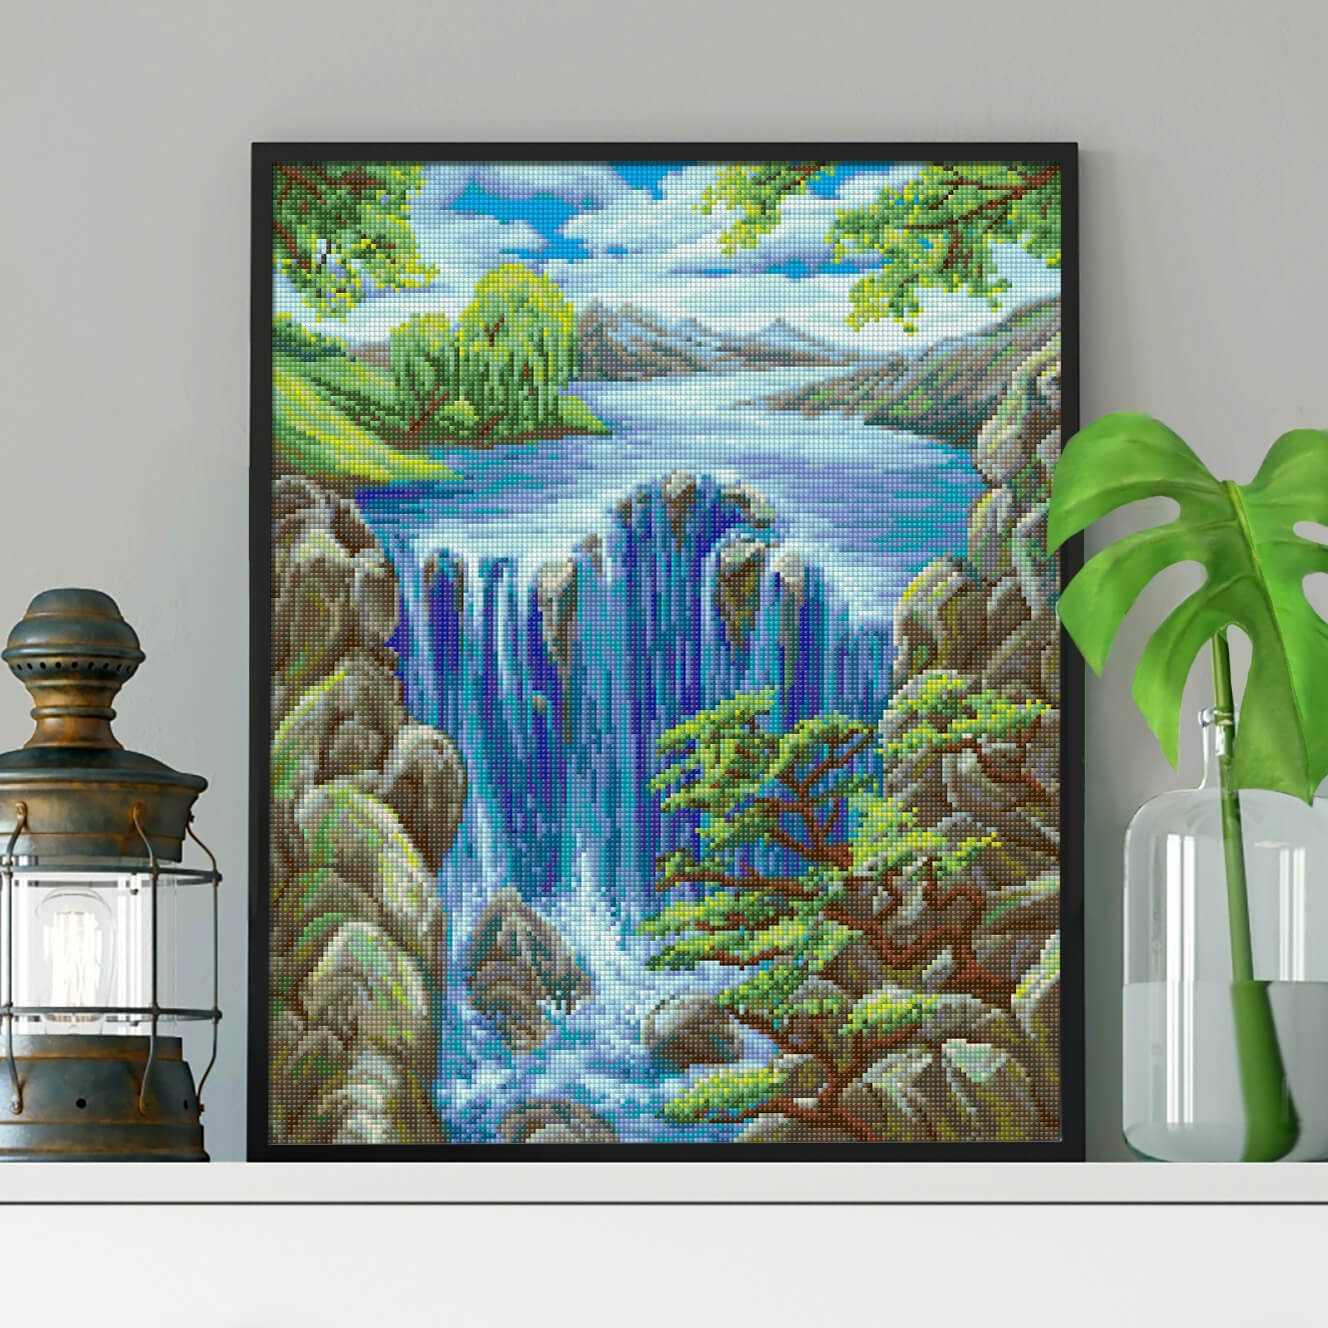 Водопад среди скал (АЖ-1643) - картина стразами